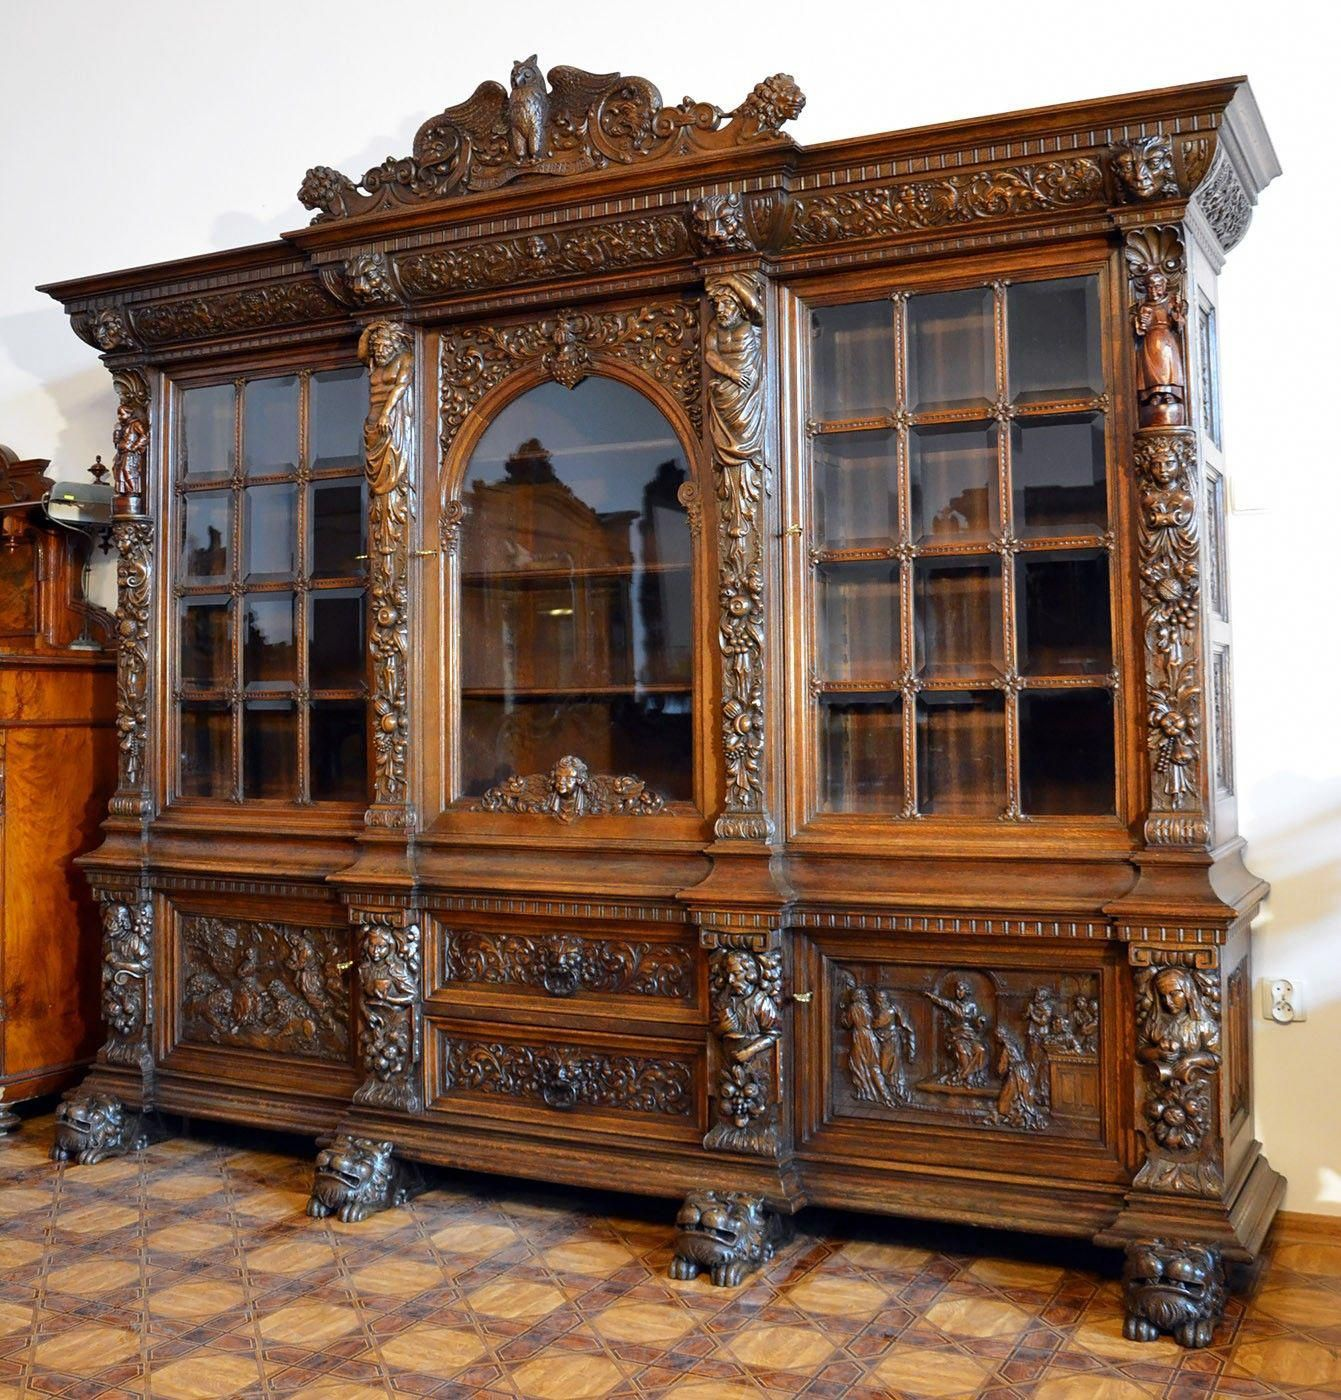 Diy Antique Home Design Antiquehomedesign Muebles Antiguos Muebles Clasicos Decoracion De Vitrina